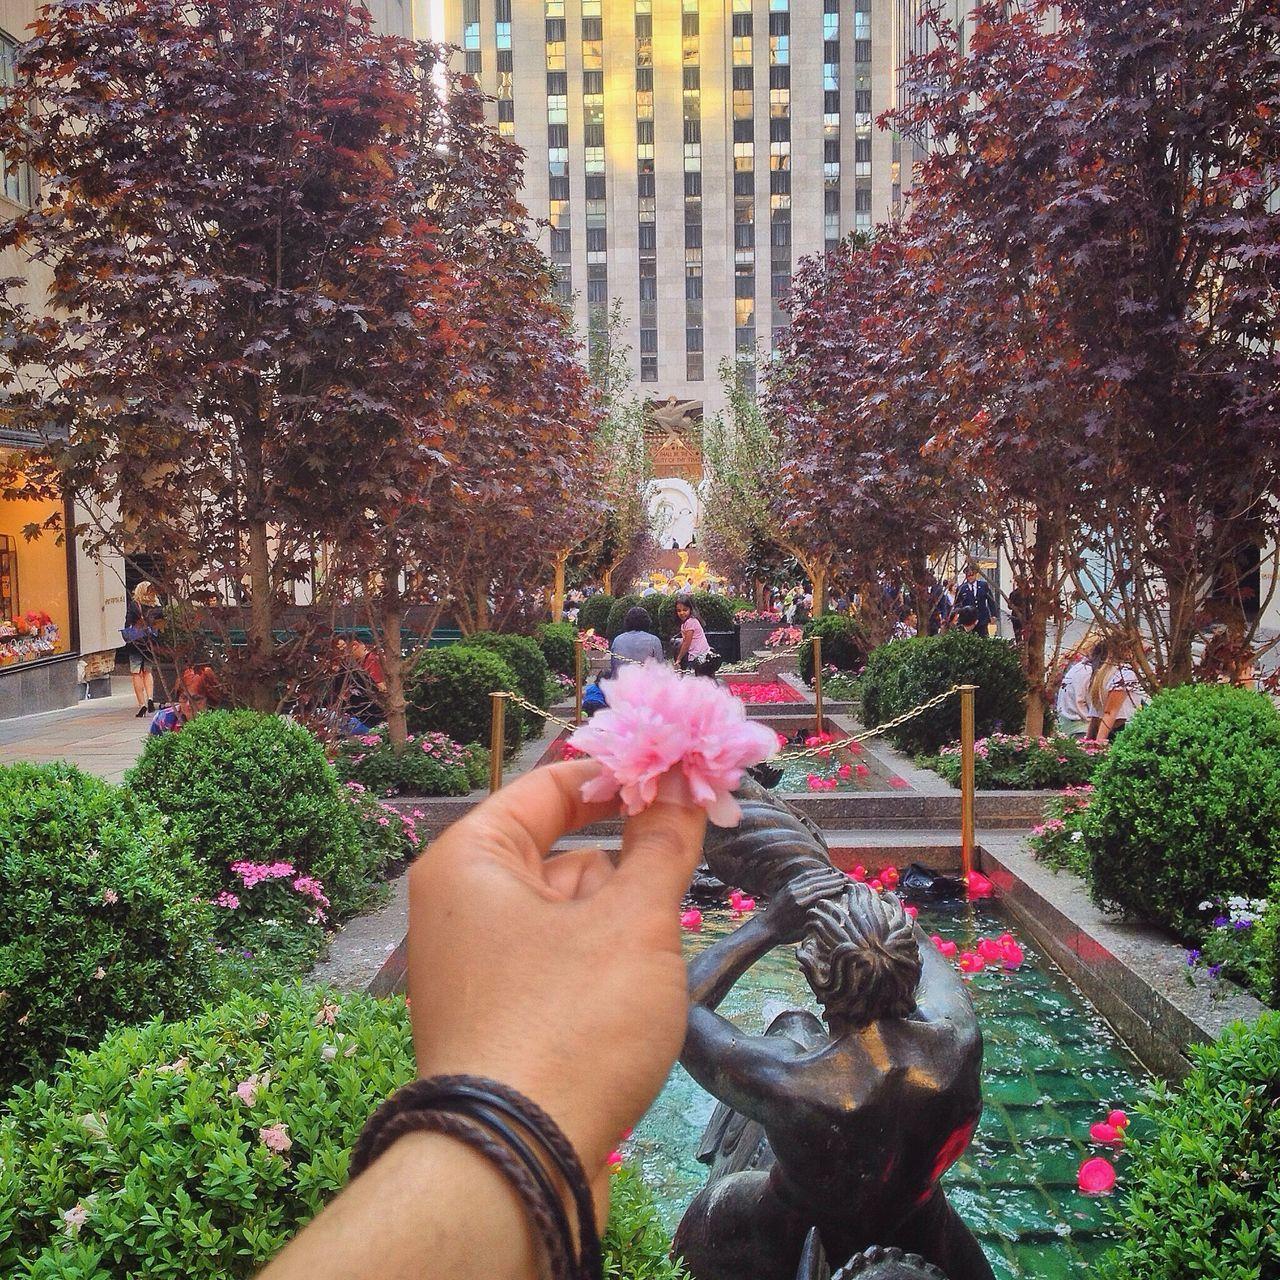 Pink Flower Flowers Rockerfellercenter NYC NYC Photography Rockerfeller Newyork New York New York City Flower